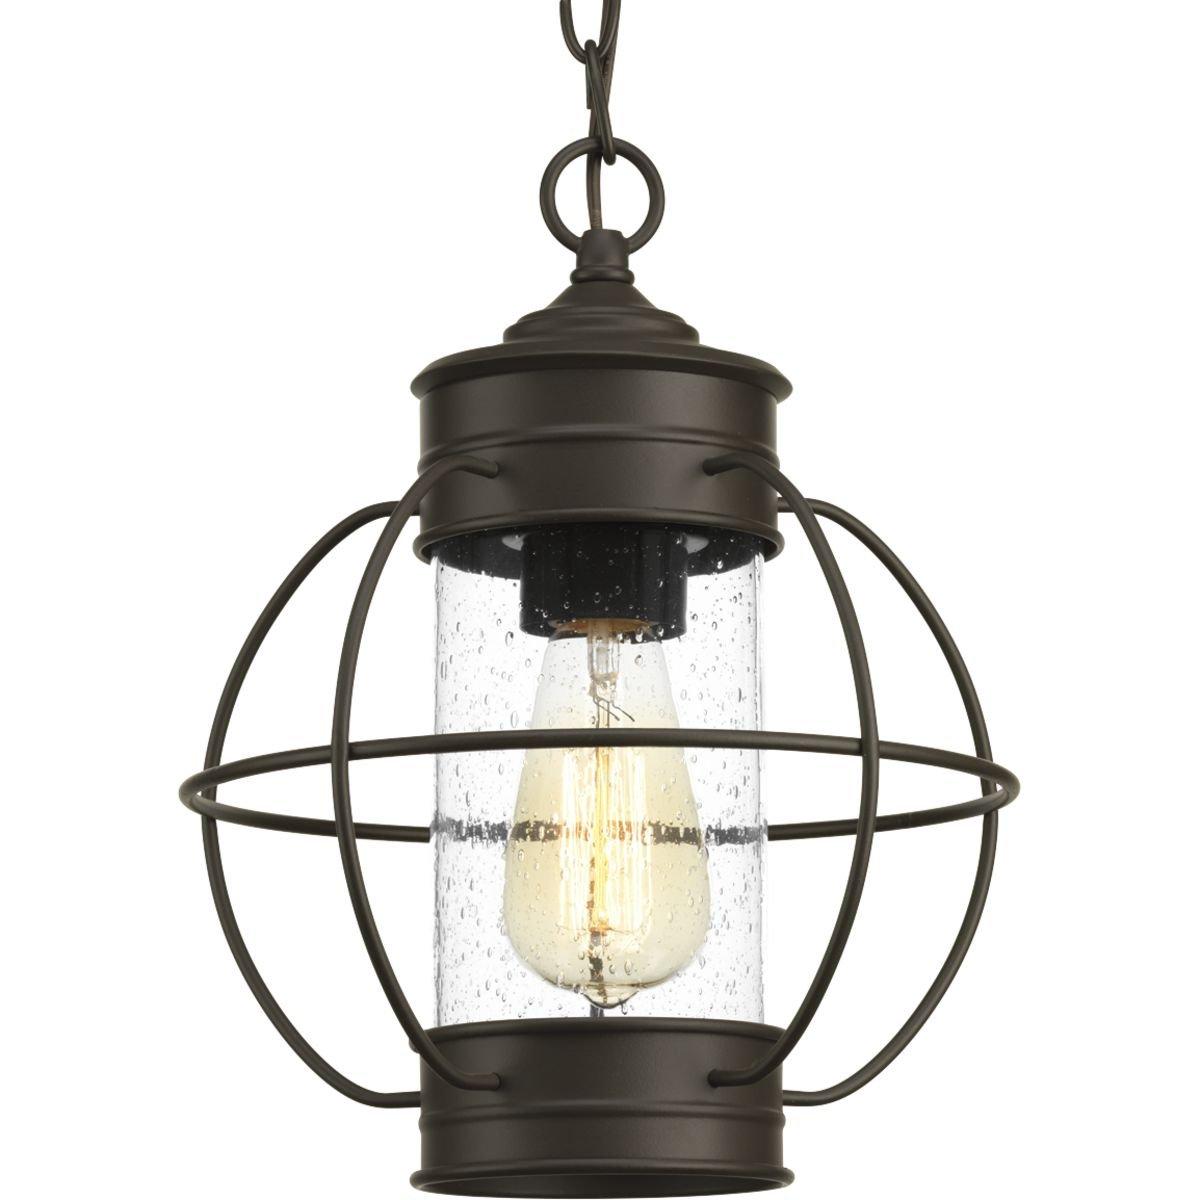 Progress Lighting P550015-020 Haddon Antique Bronze One-Light Hanging Lantern,